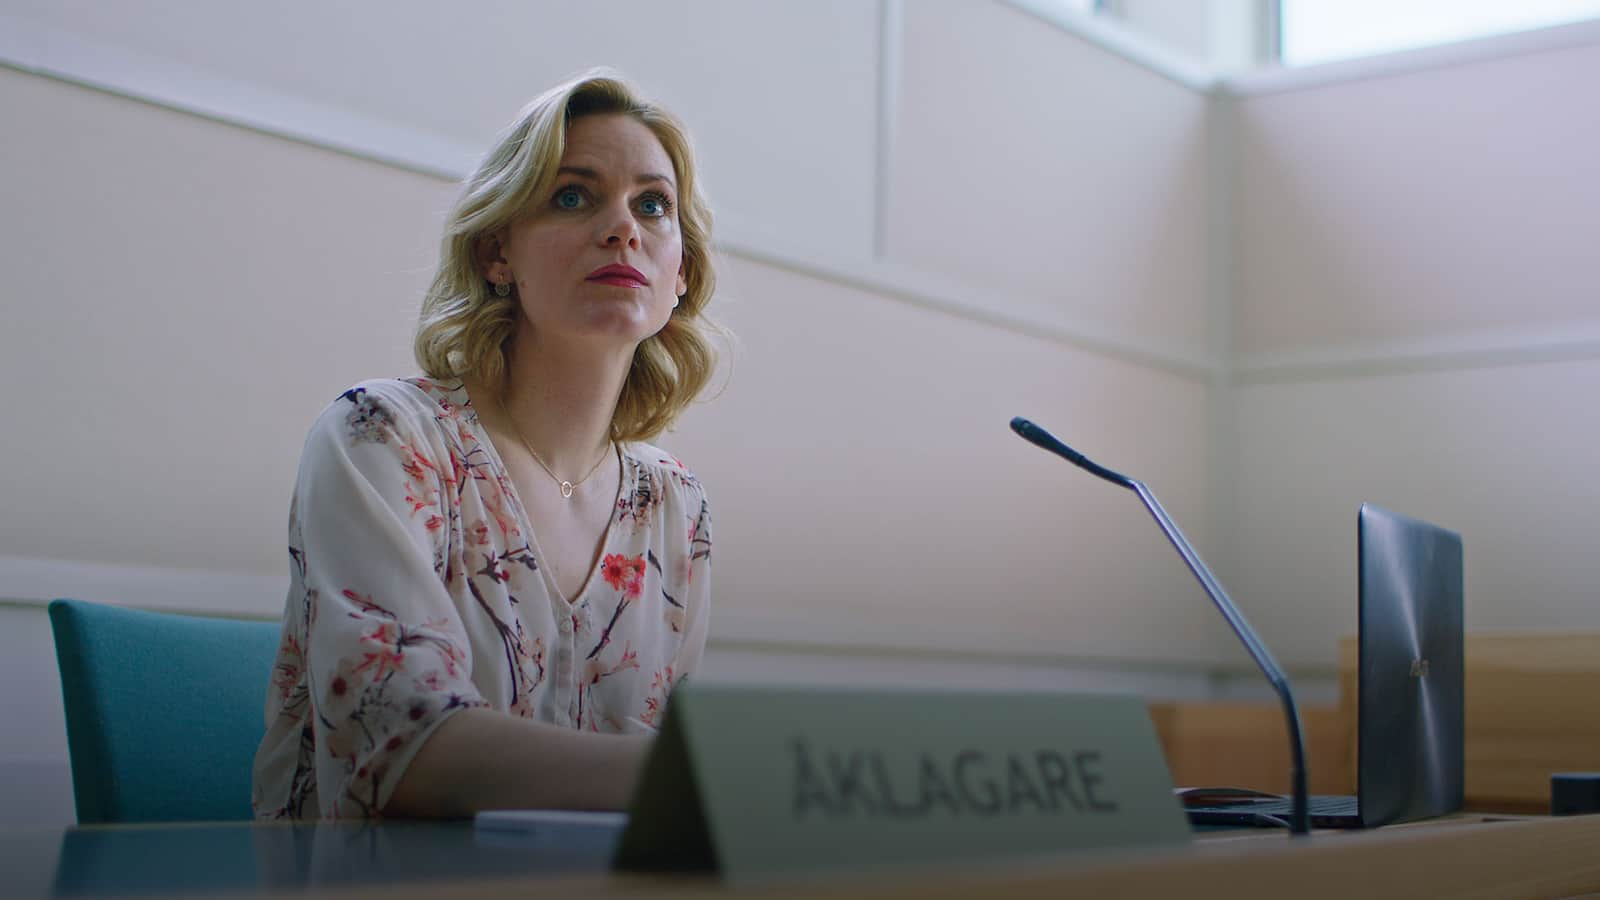 advokaten/season-1/episode-4